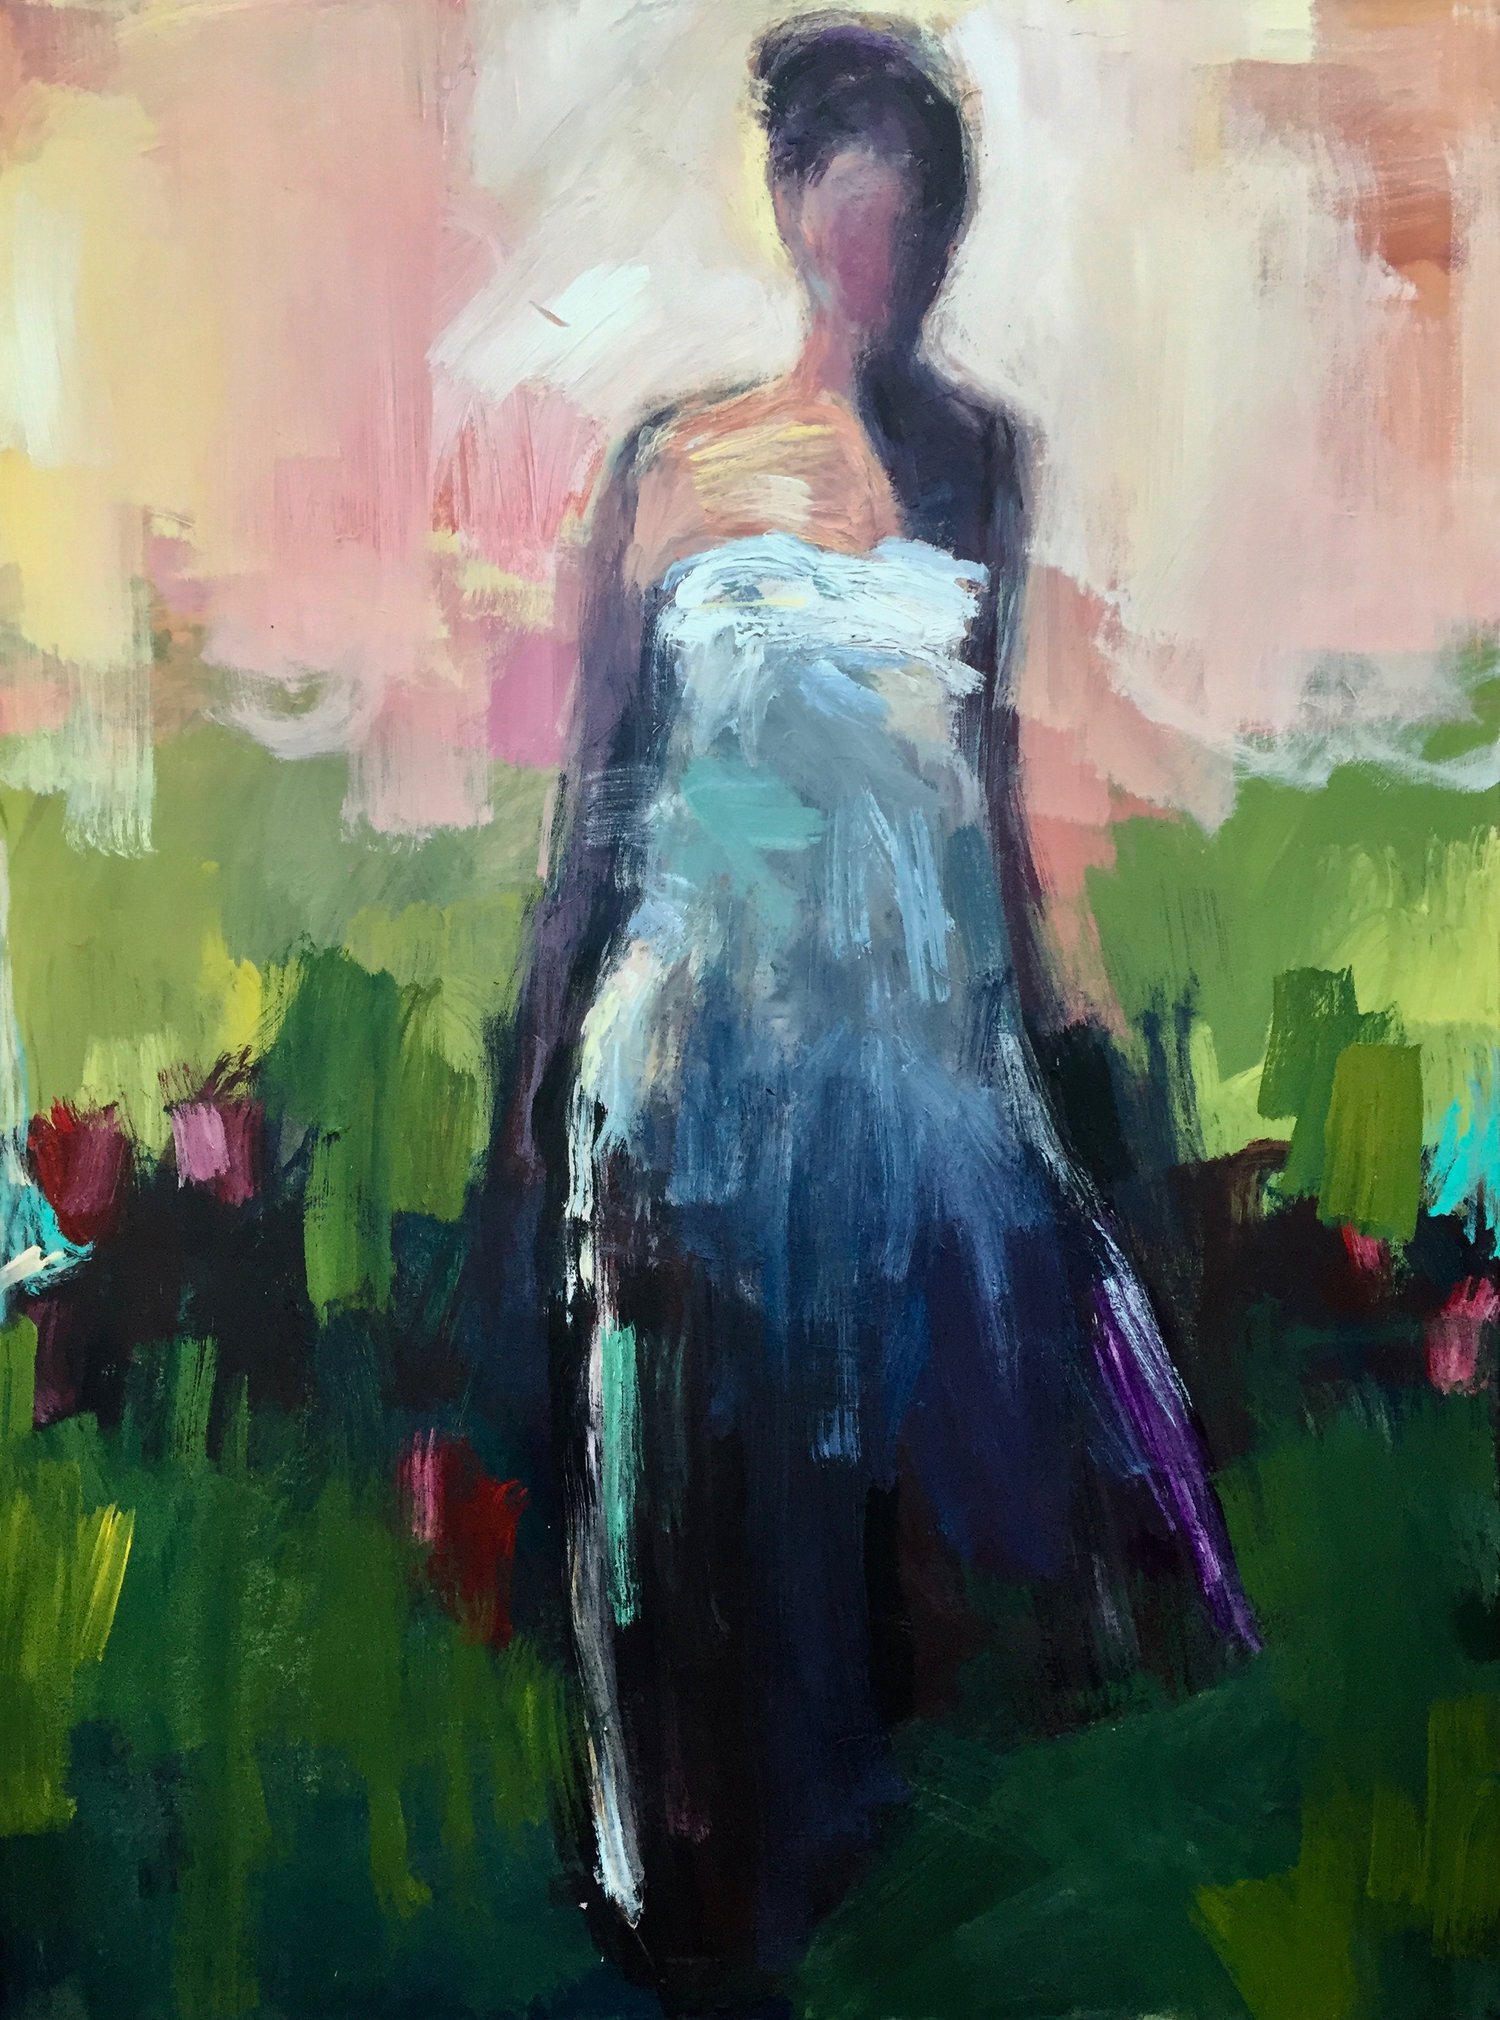 _Walk+of+Splendor_mixed+media+on+canvas_48 x 36 inches